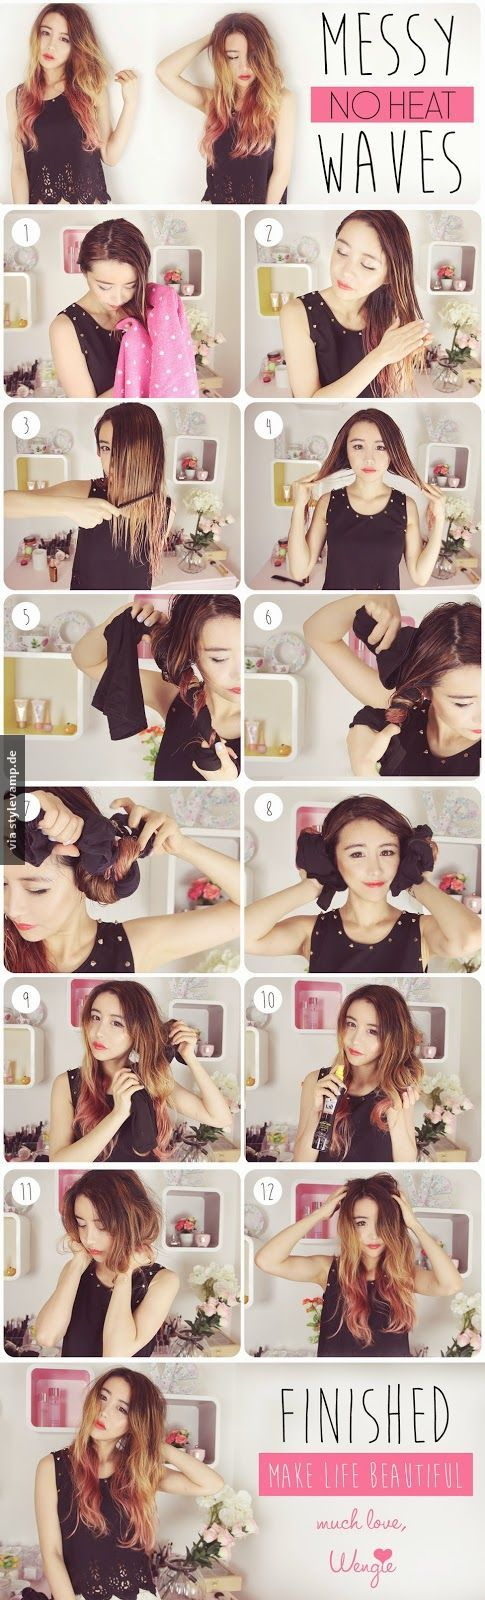 Perfekte Wellen Ohne Hitze Frisuren Hair Styles Messy